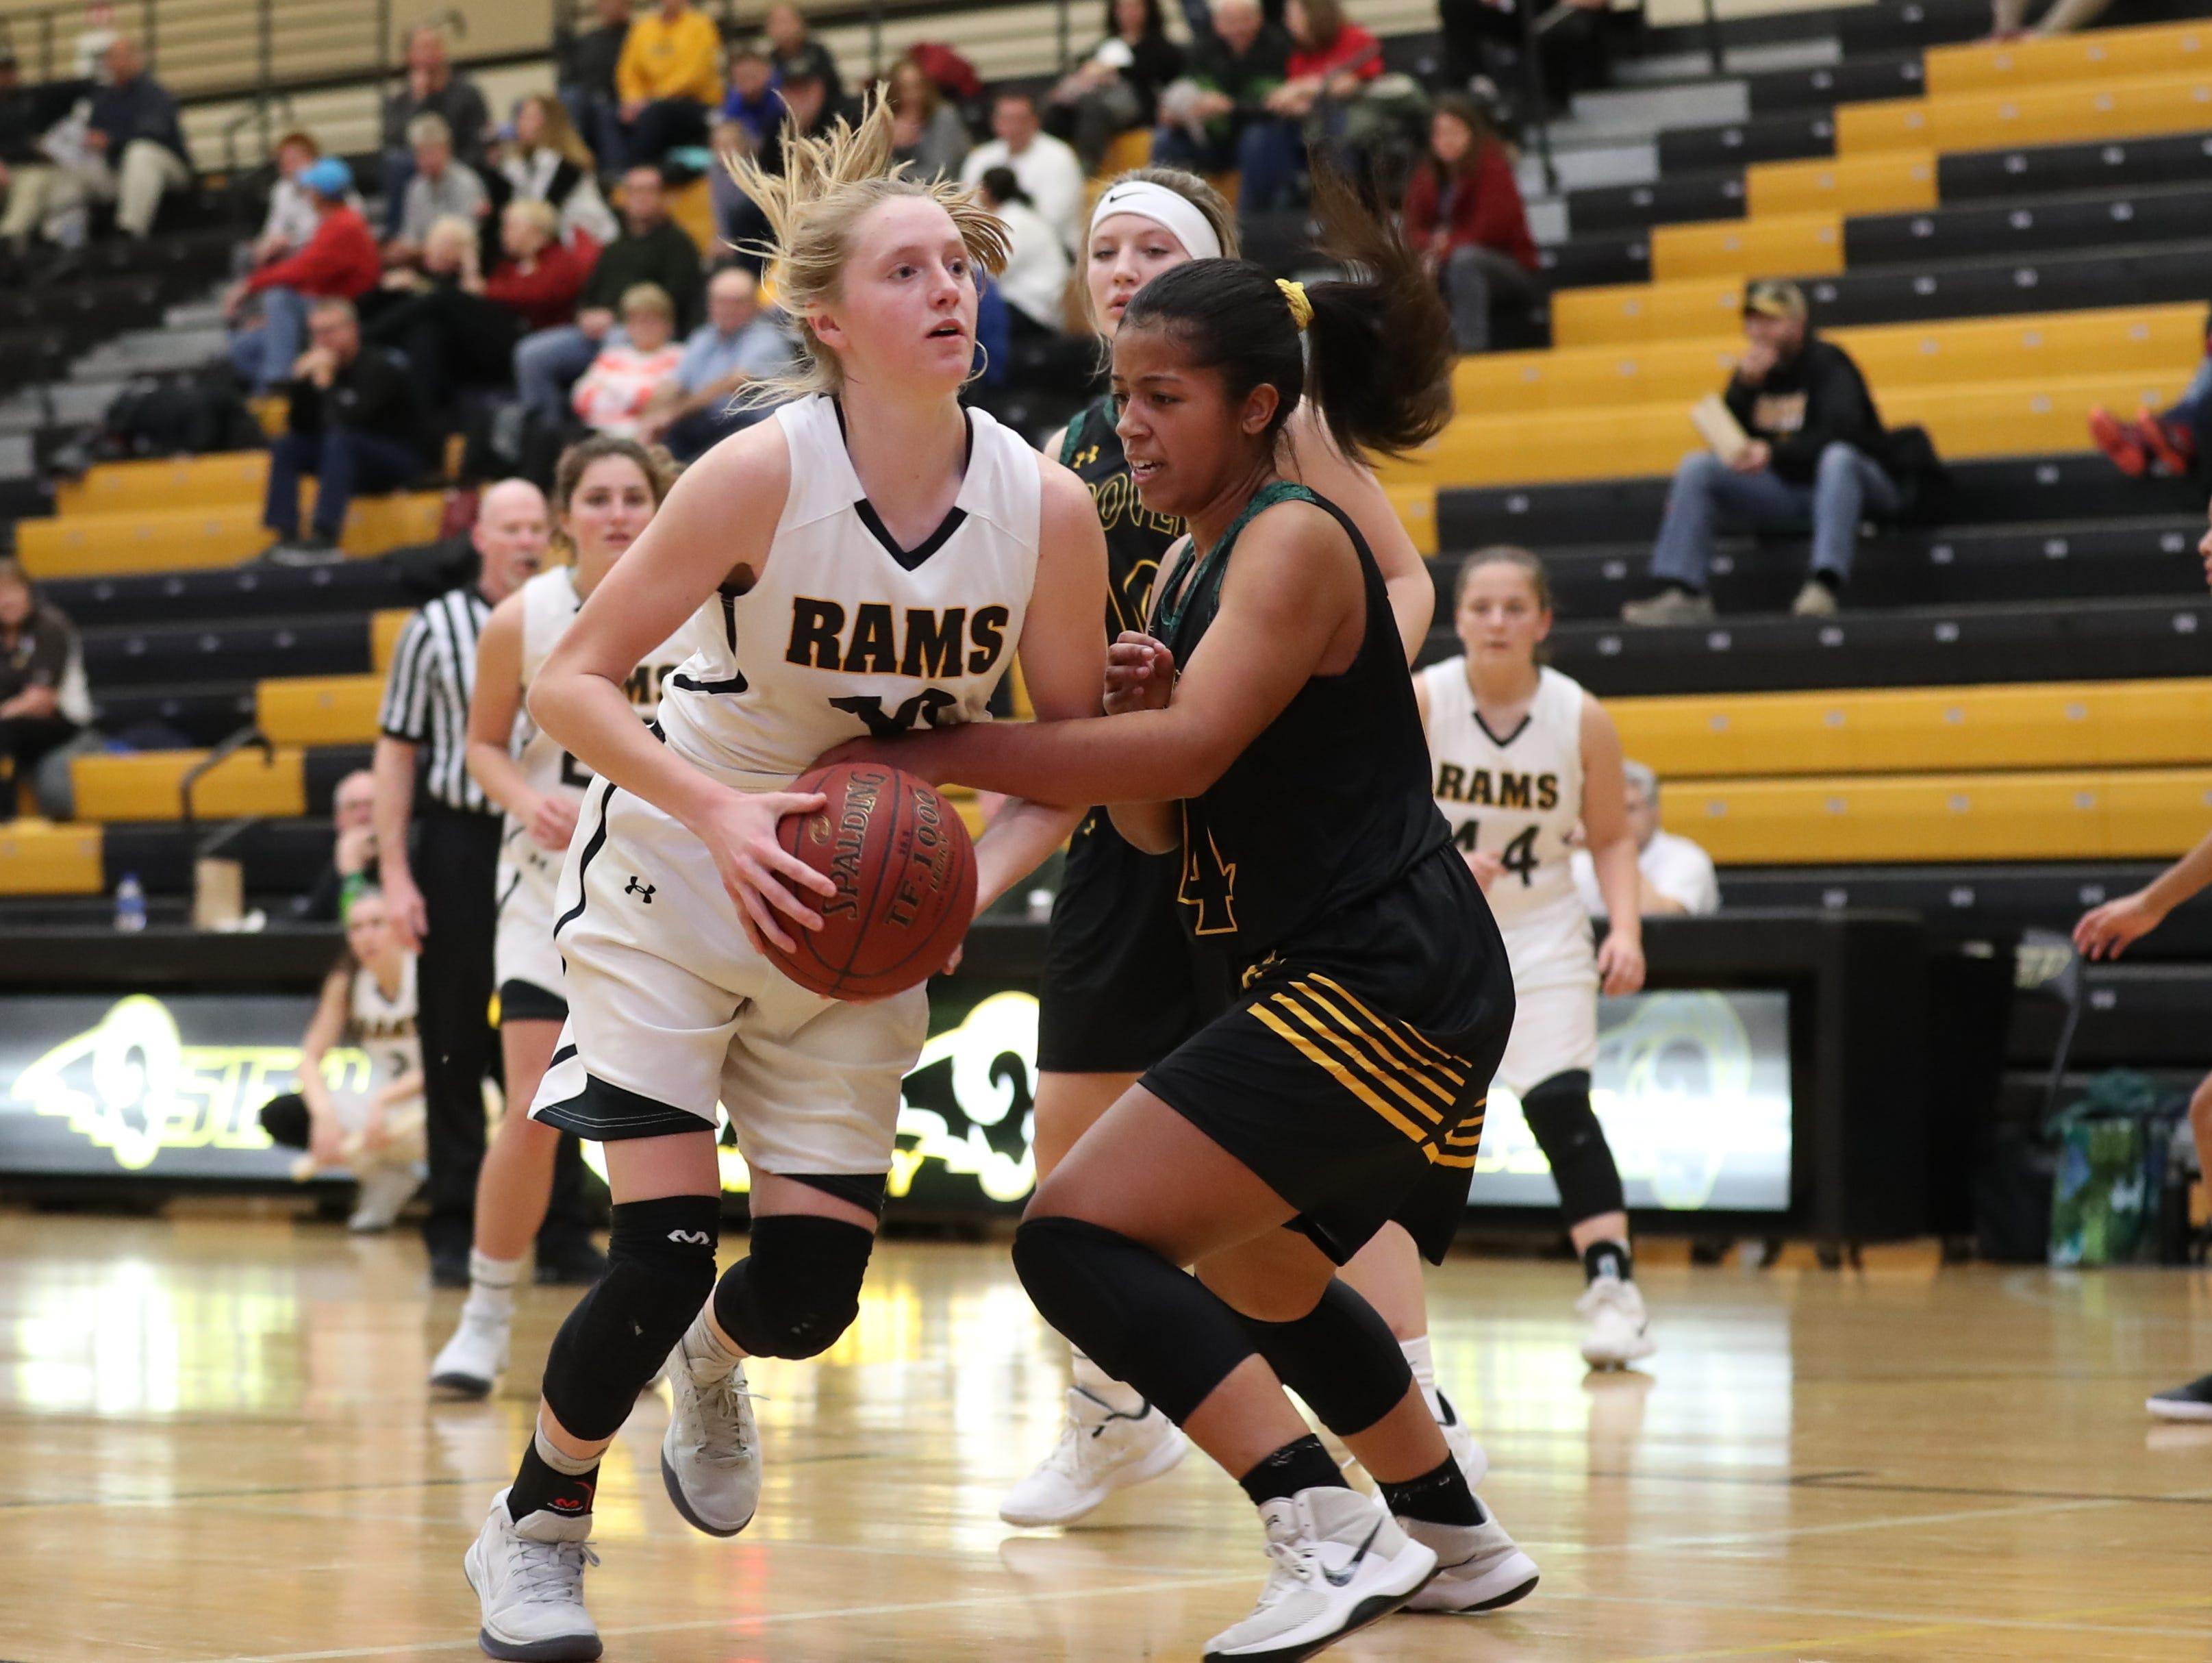 Southeast Polk Rams Grace Larkins (10) drives to the basket against the Hoover Huskies at Southeast Polk High School.